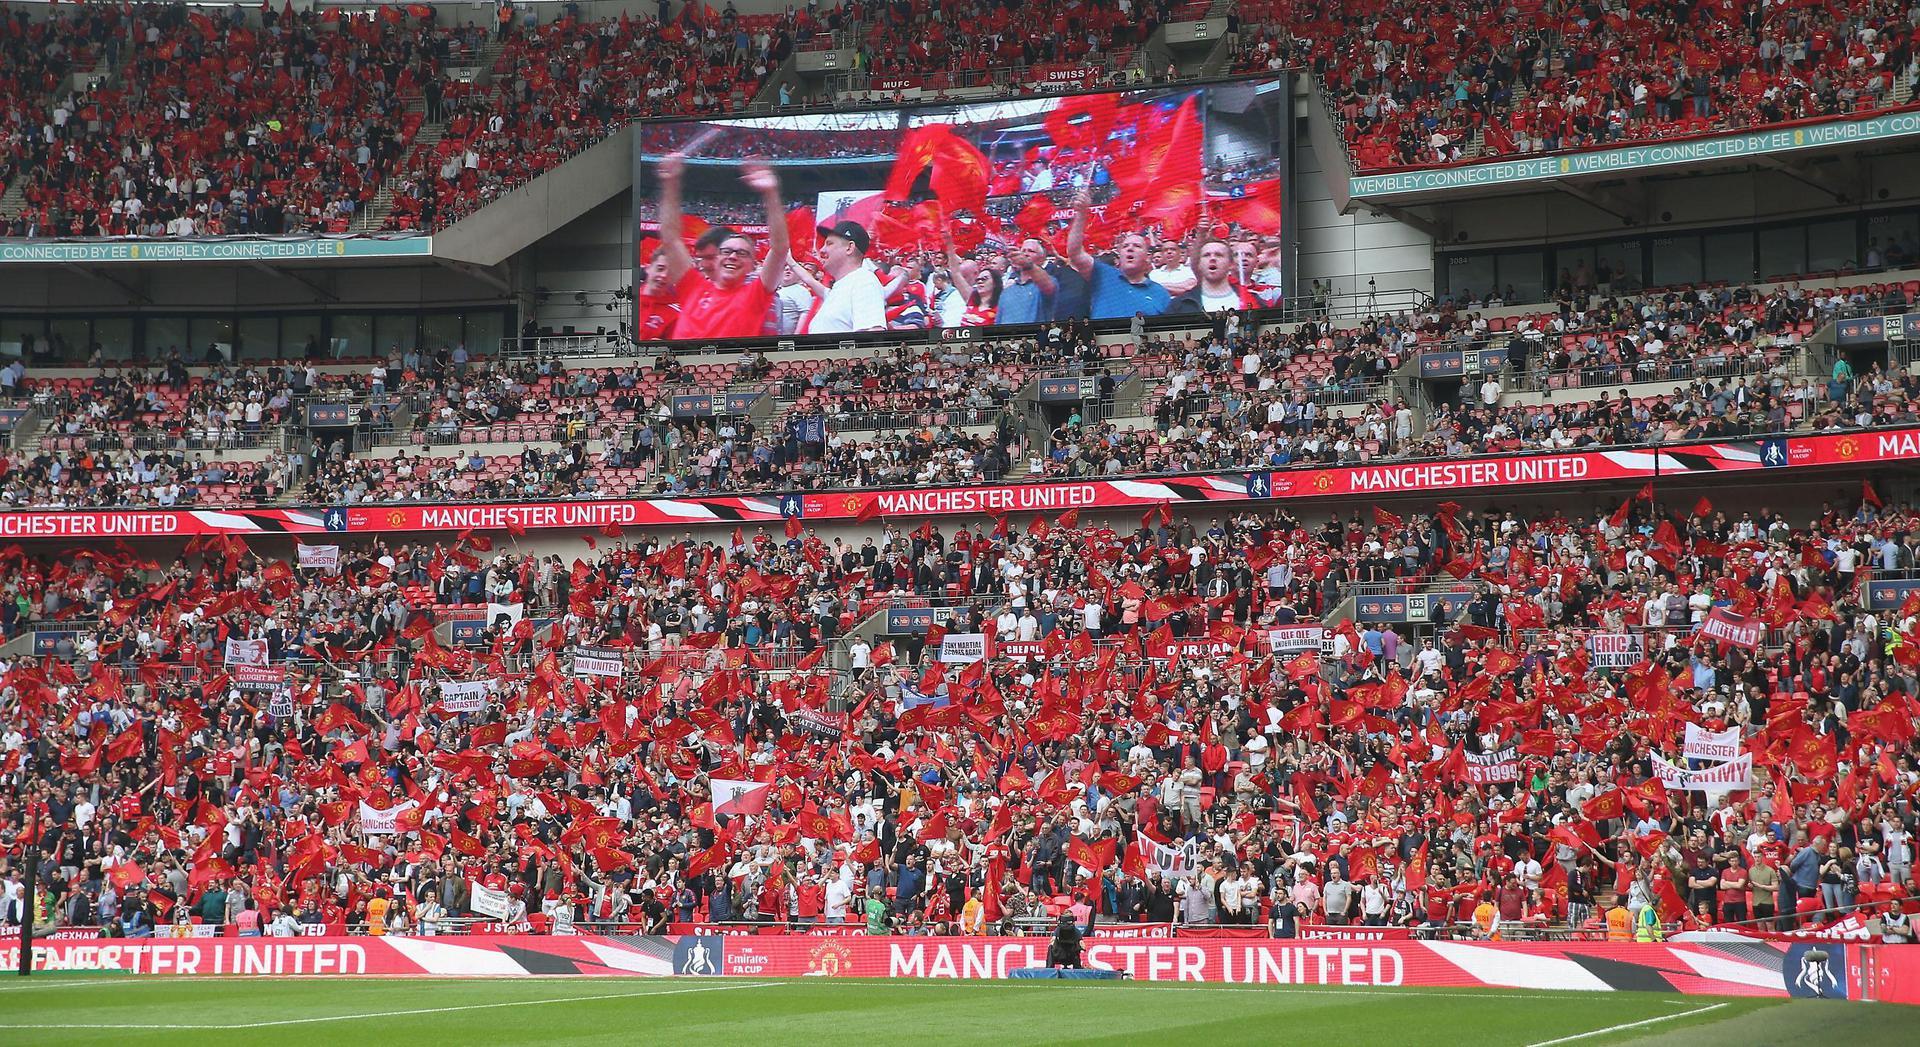 حضور جماهيري في نصف نهائي كأس الاتحاد الإنجليزي